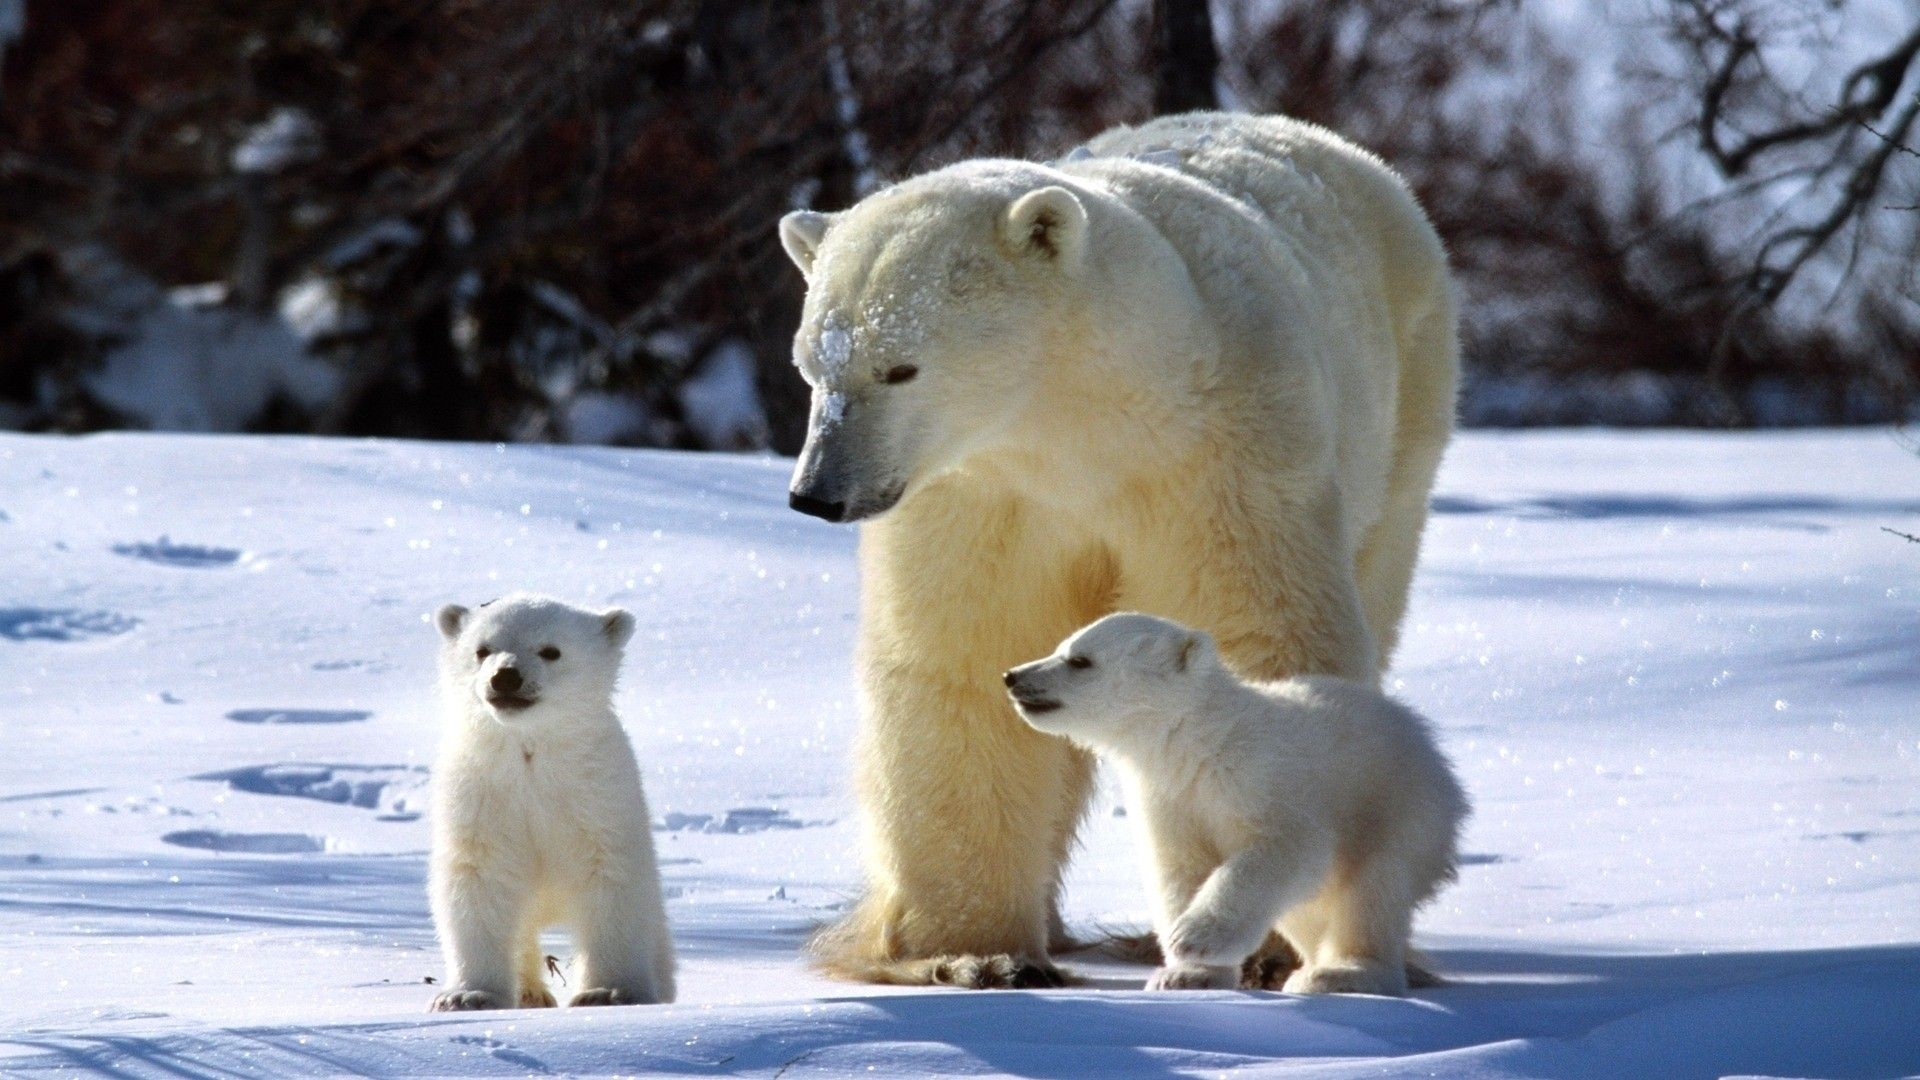 Arctic Animal Polar Bear and Babies Wallpaper HD 21 Baby